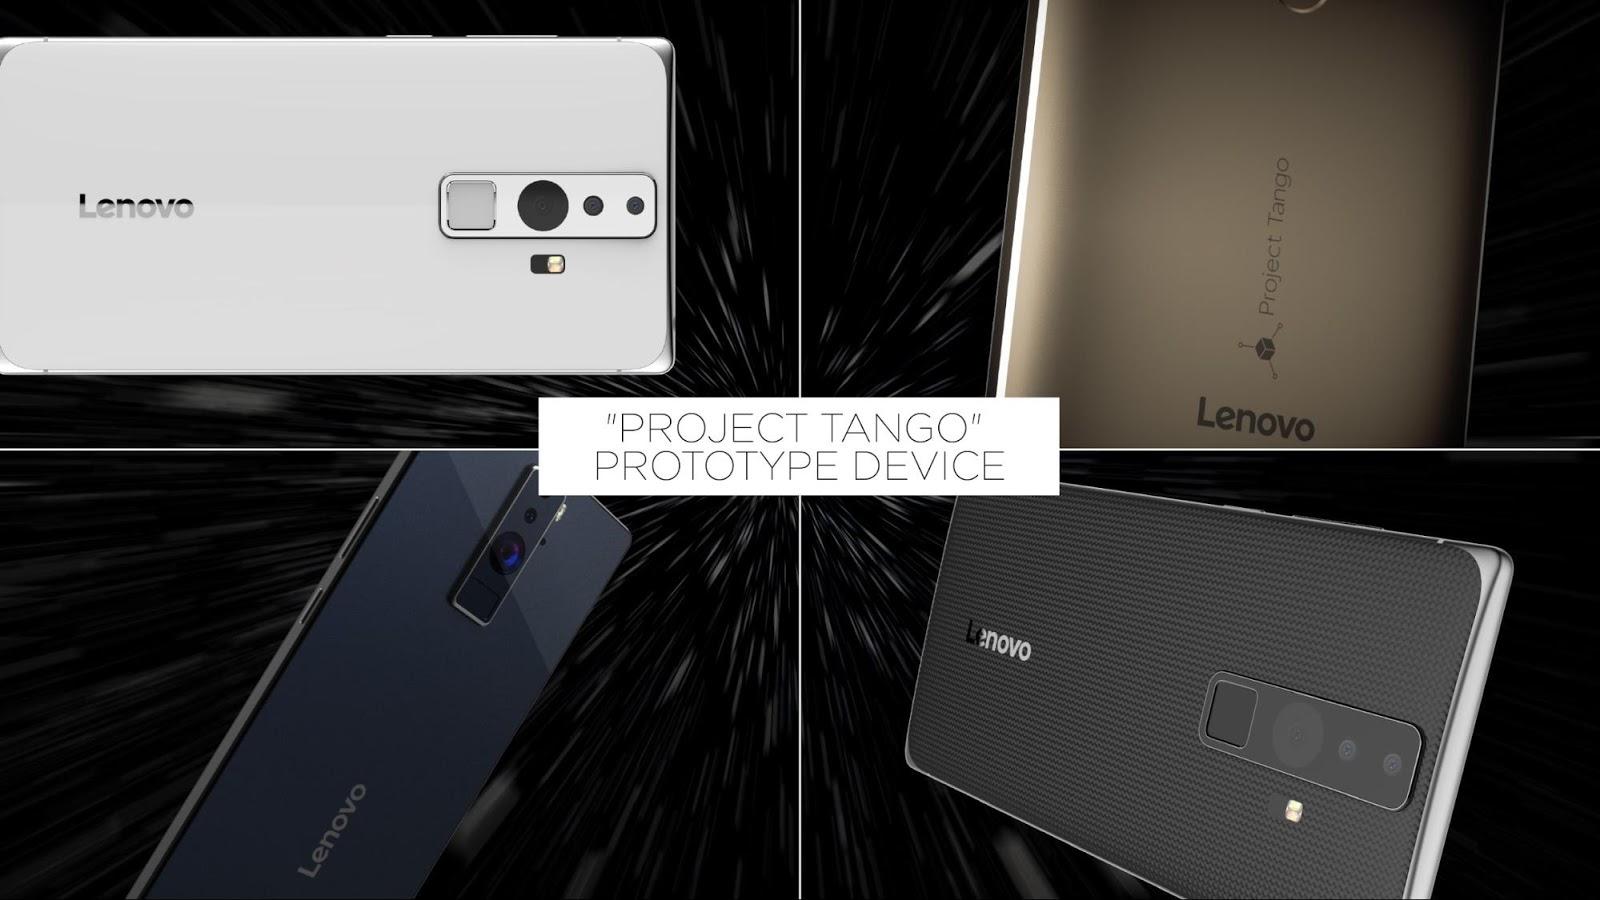 project Tango smartphone prototype